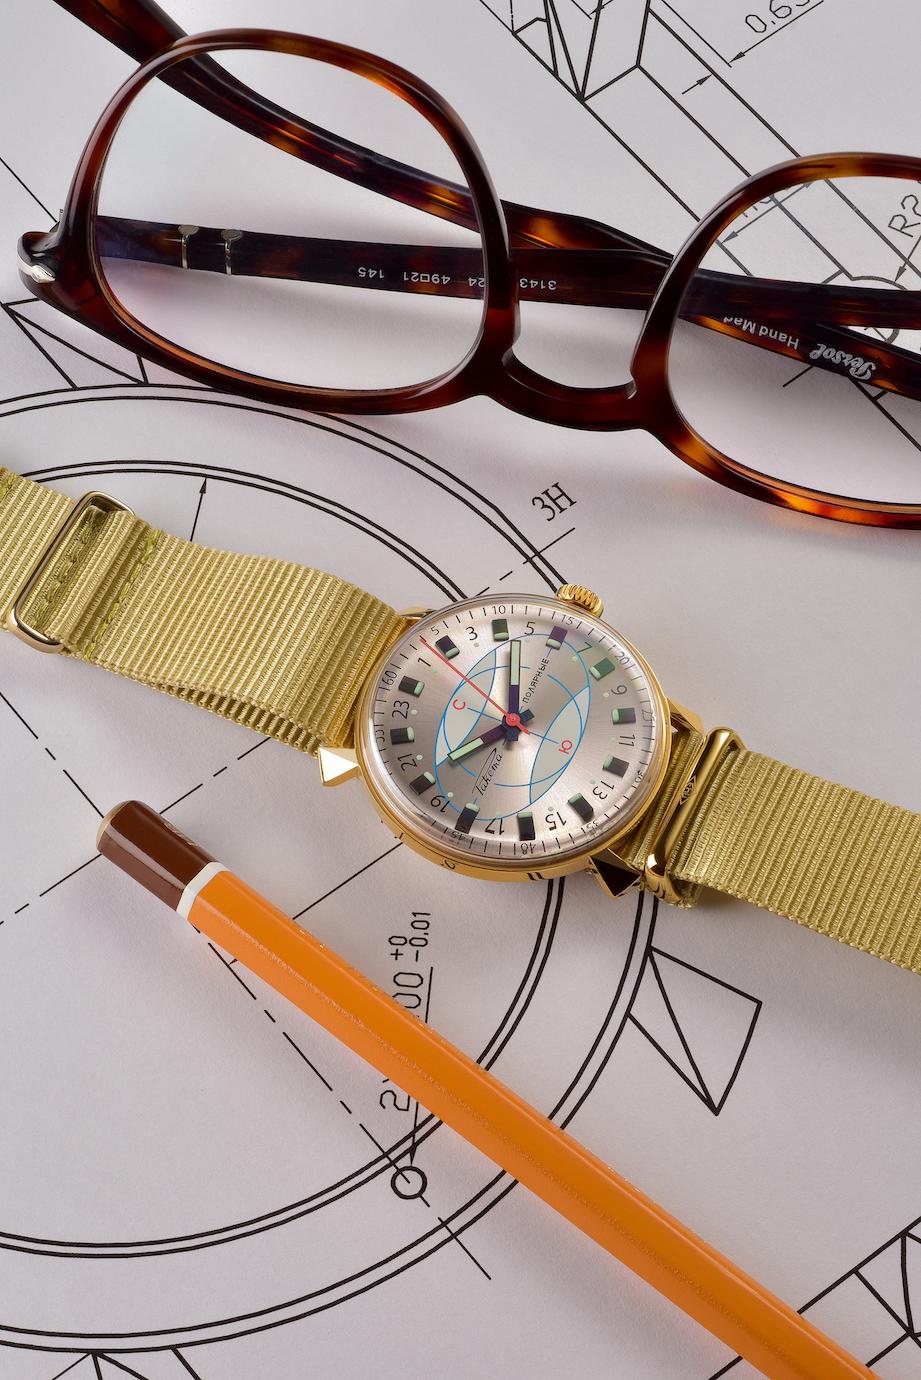 Raketa's new Polar Watch Re-edition Rakpol1